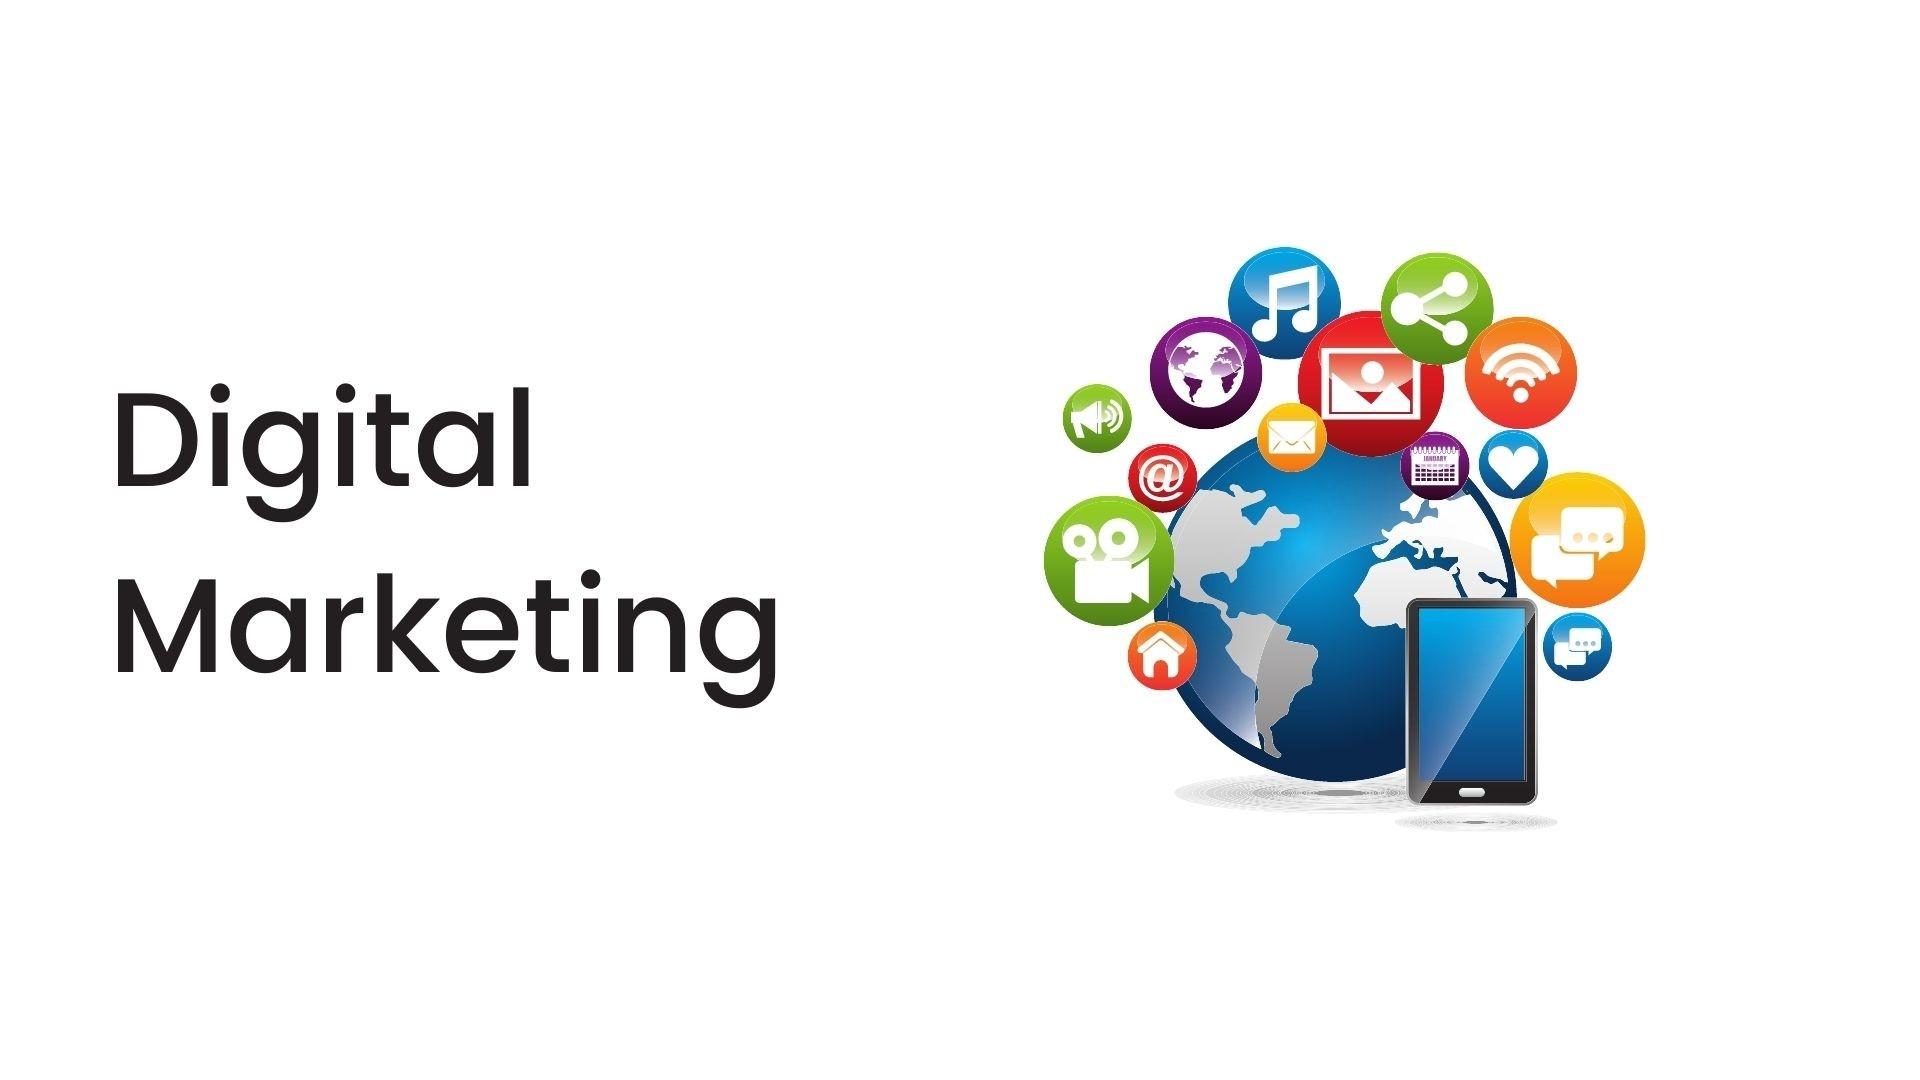 Digital_Coach_Academy_Personal_Branding_Architect_Digital_Marketing